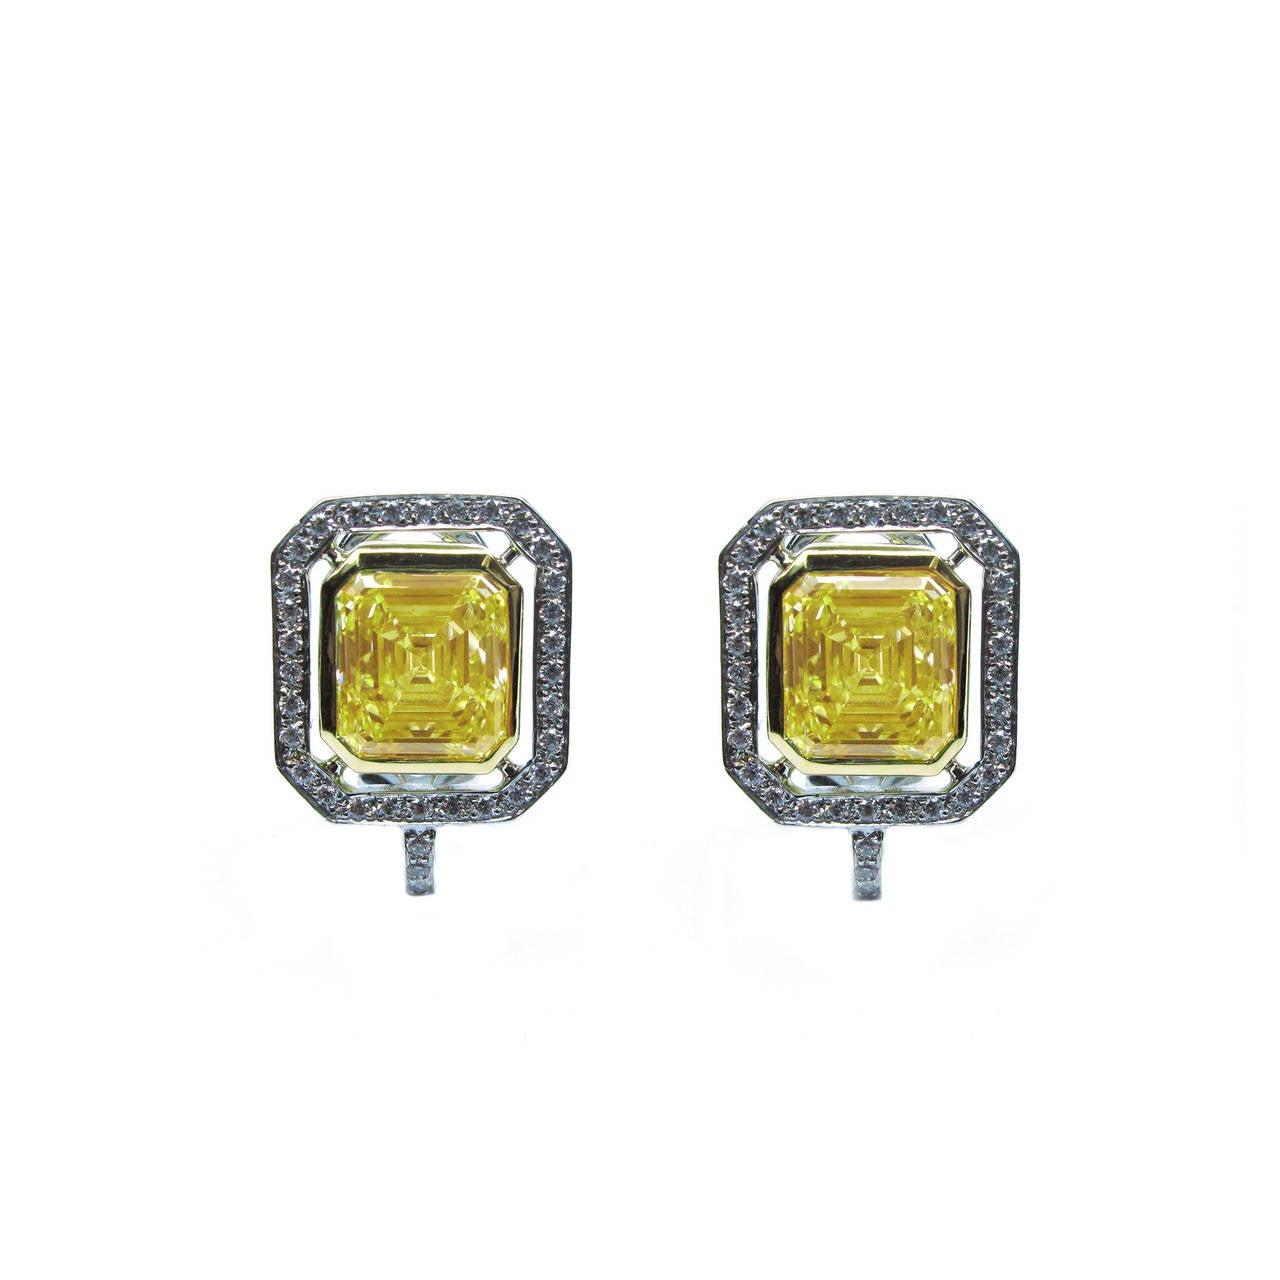 6.70 Carat GIA Cert Fancy Yellow Emerald cut  Diamond Frame Earrings